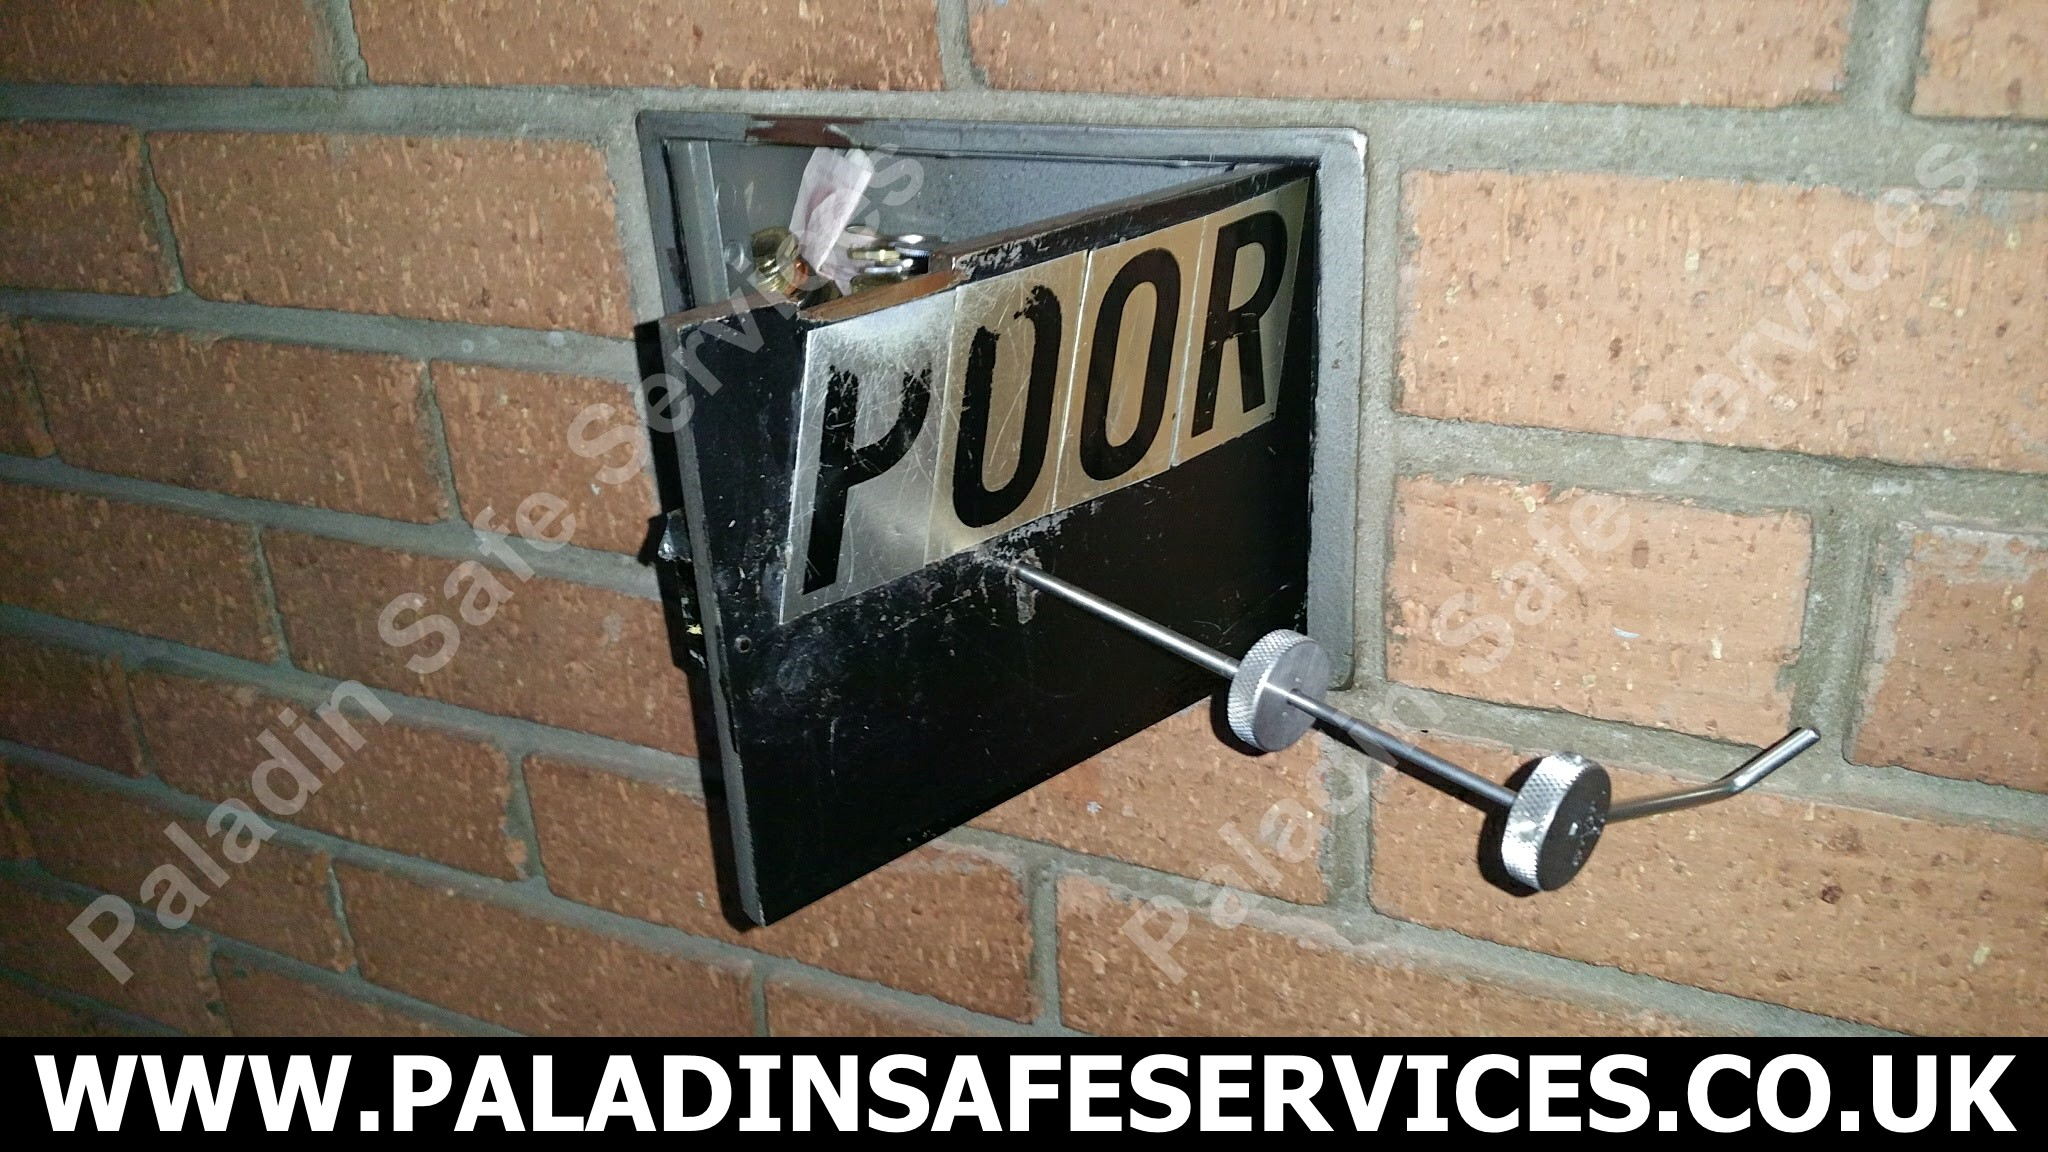 Chubb Wall Safes Lost Keys Paladin Safe Services